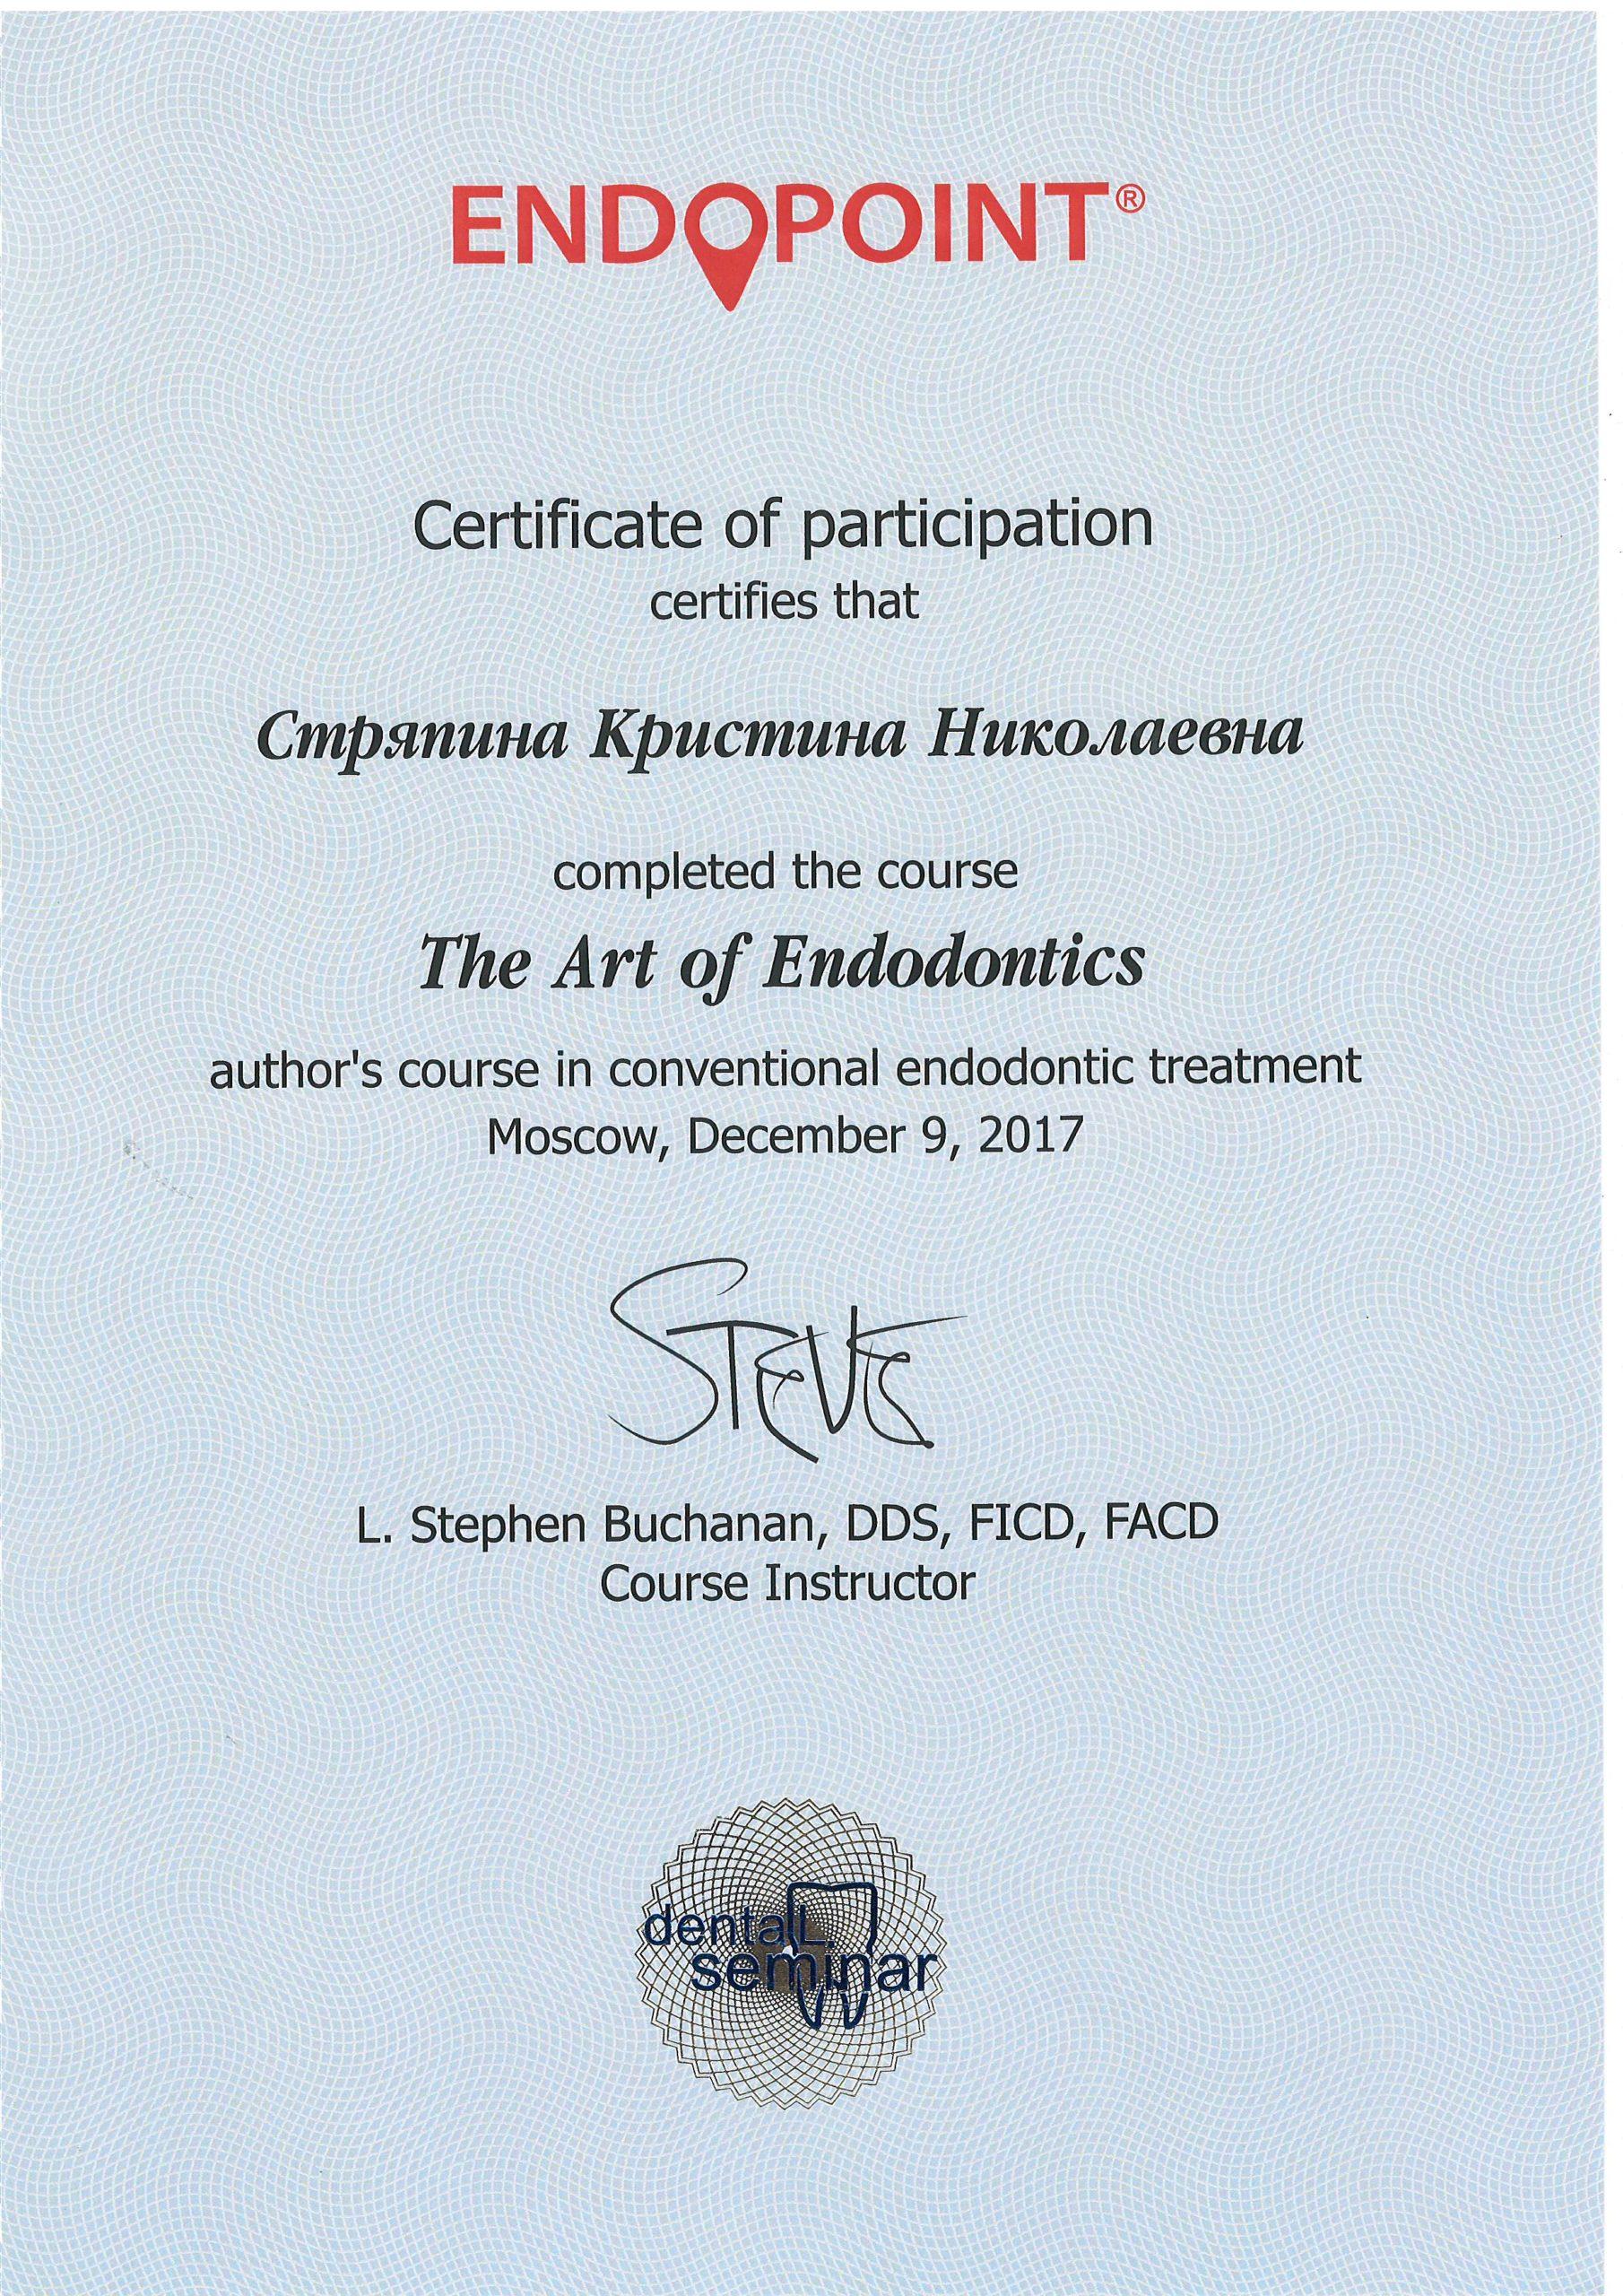 Сертификат Стряпиной Кристины (9.12.17)